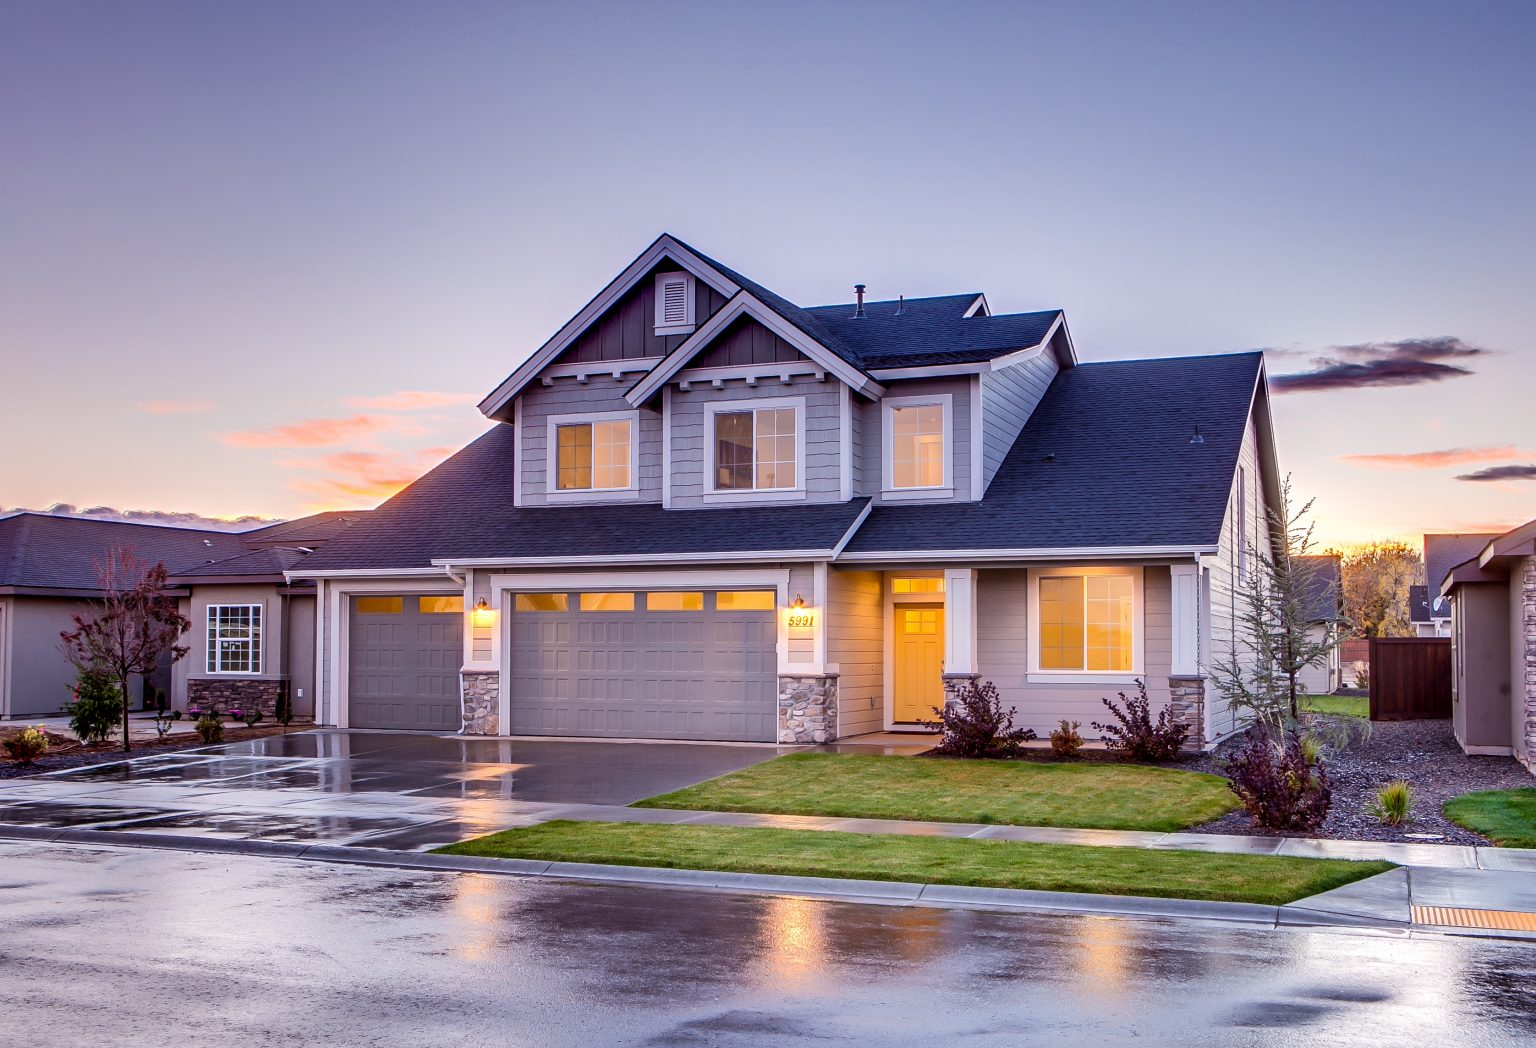 Family or Matrimonial Home